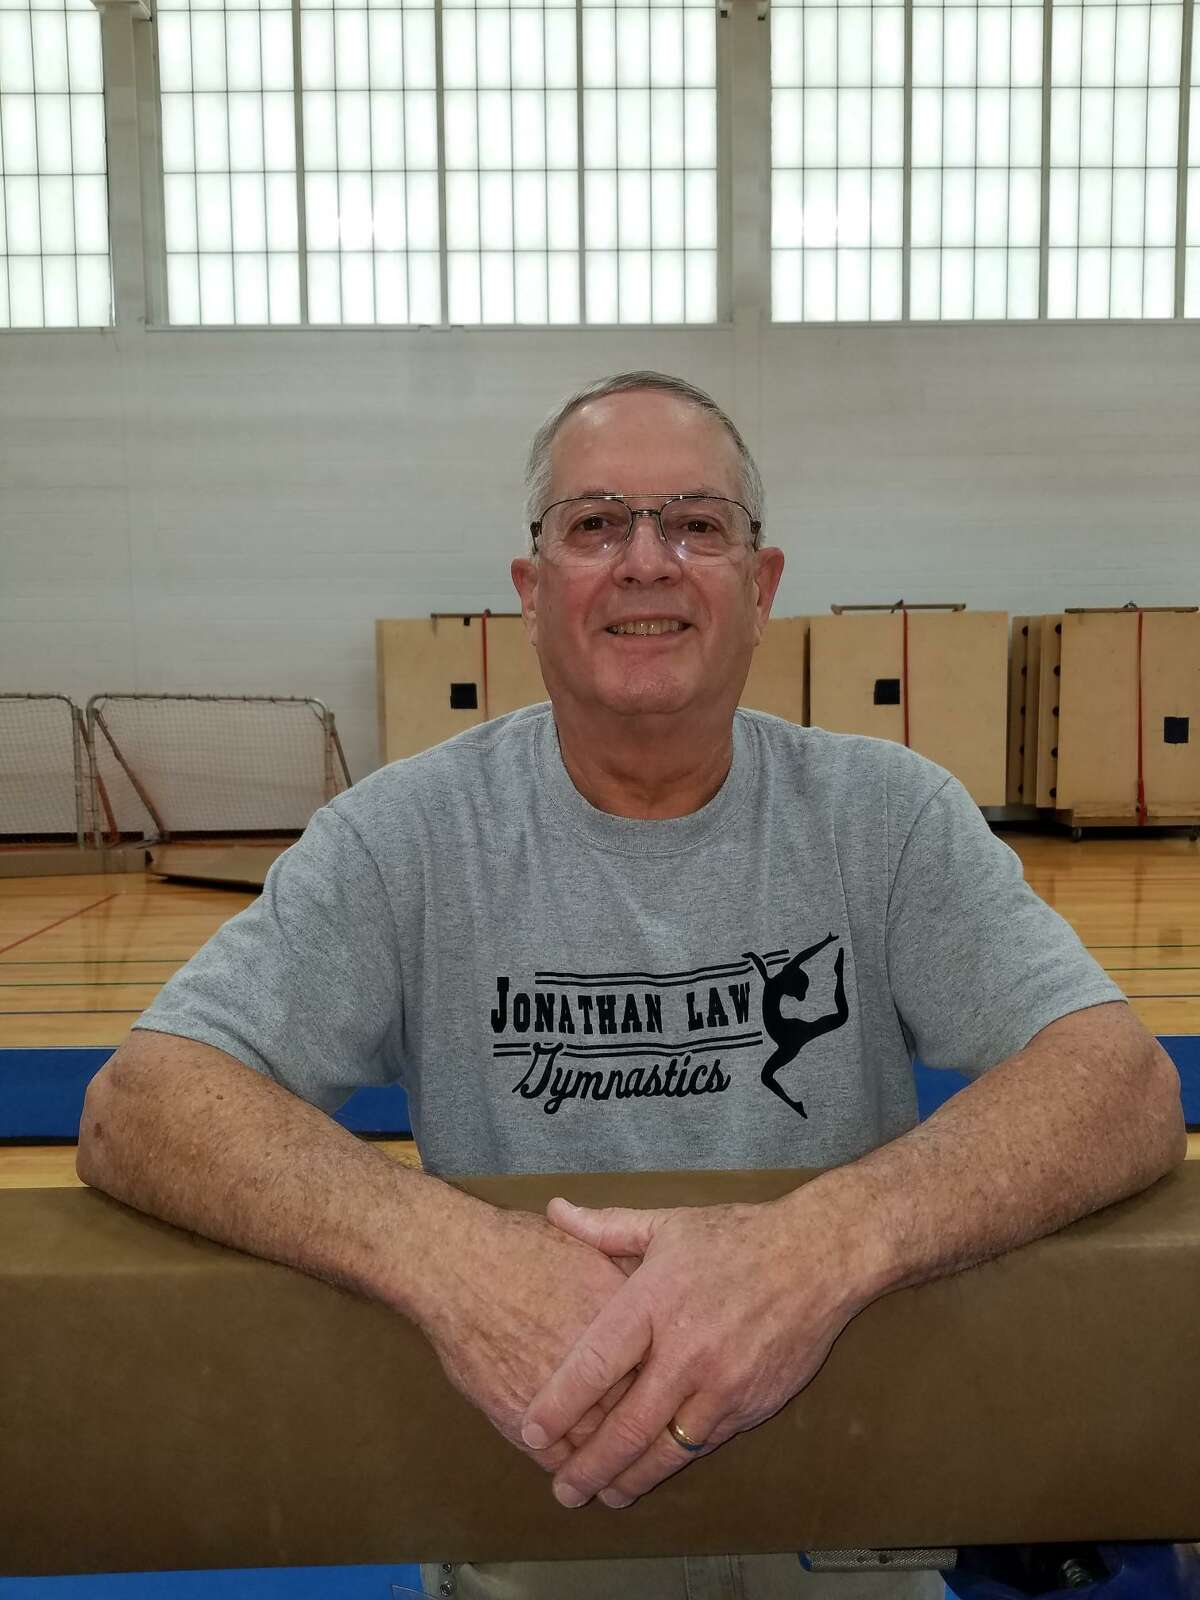 Pat Simon has guided Jonathan Law gymnastics since the program began in 1978.